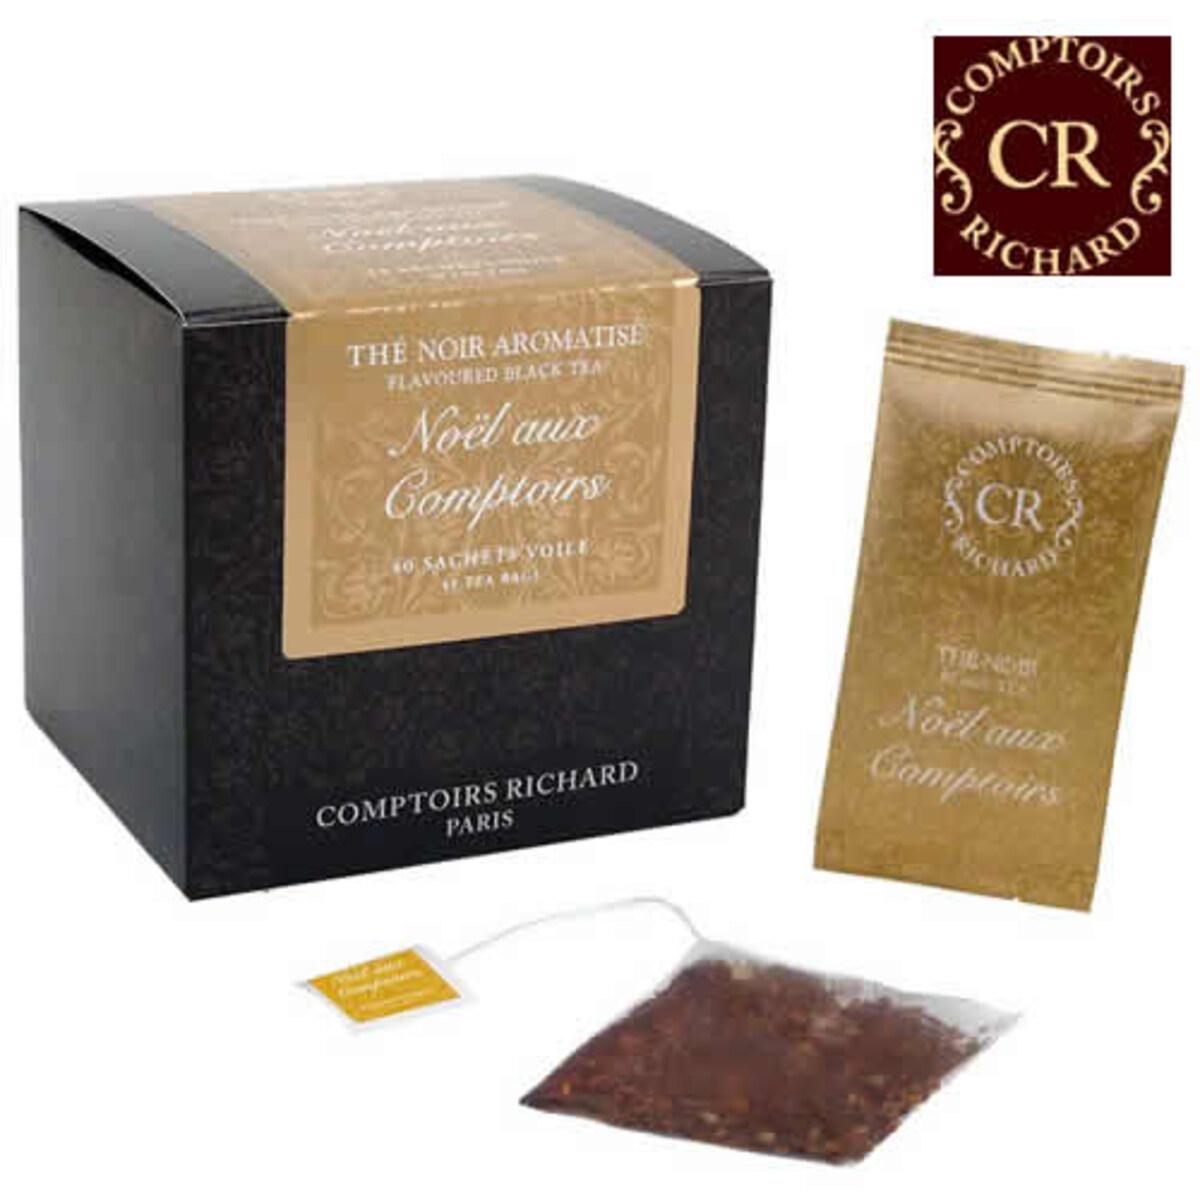 Comptoirs Richard Noël aux Comptoirs чай на сашета